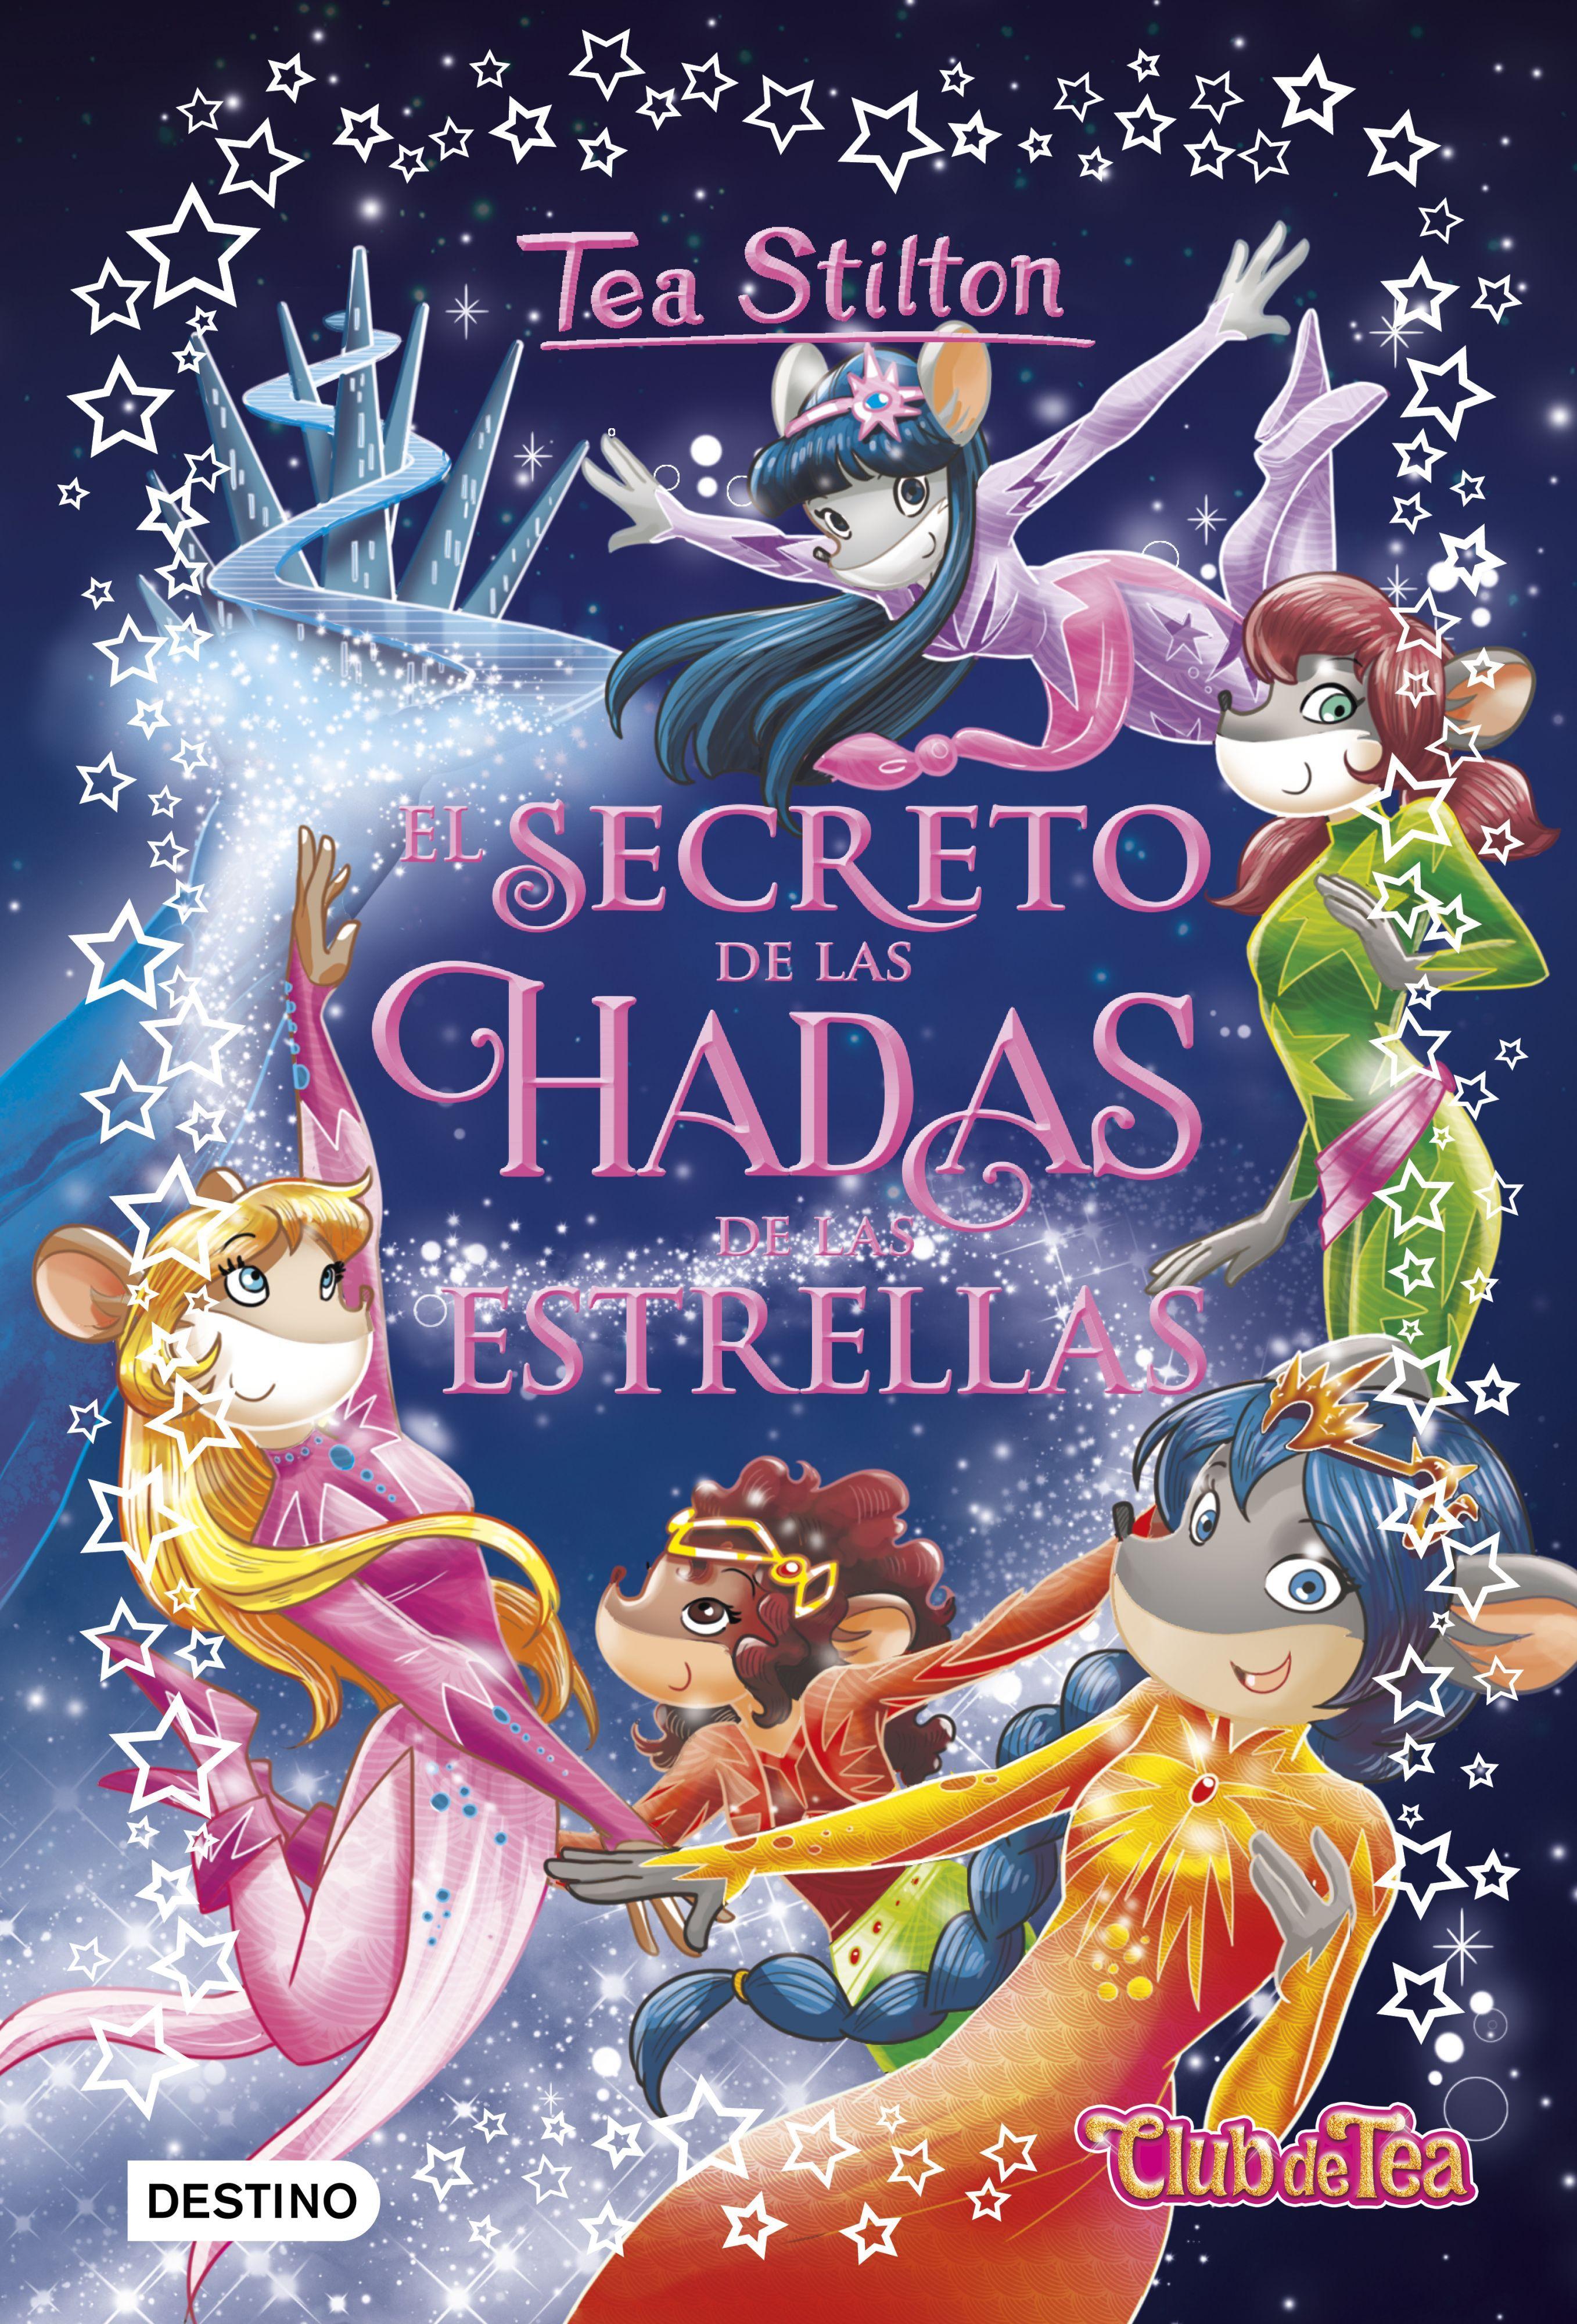 TEA STILTON EL SECRETO DE LAS HADAS DE LAS ESTRELLAS